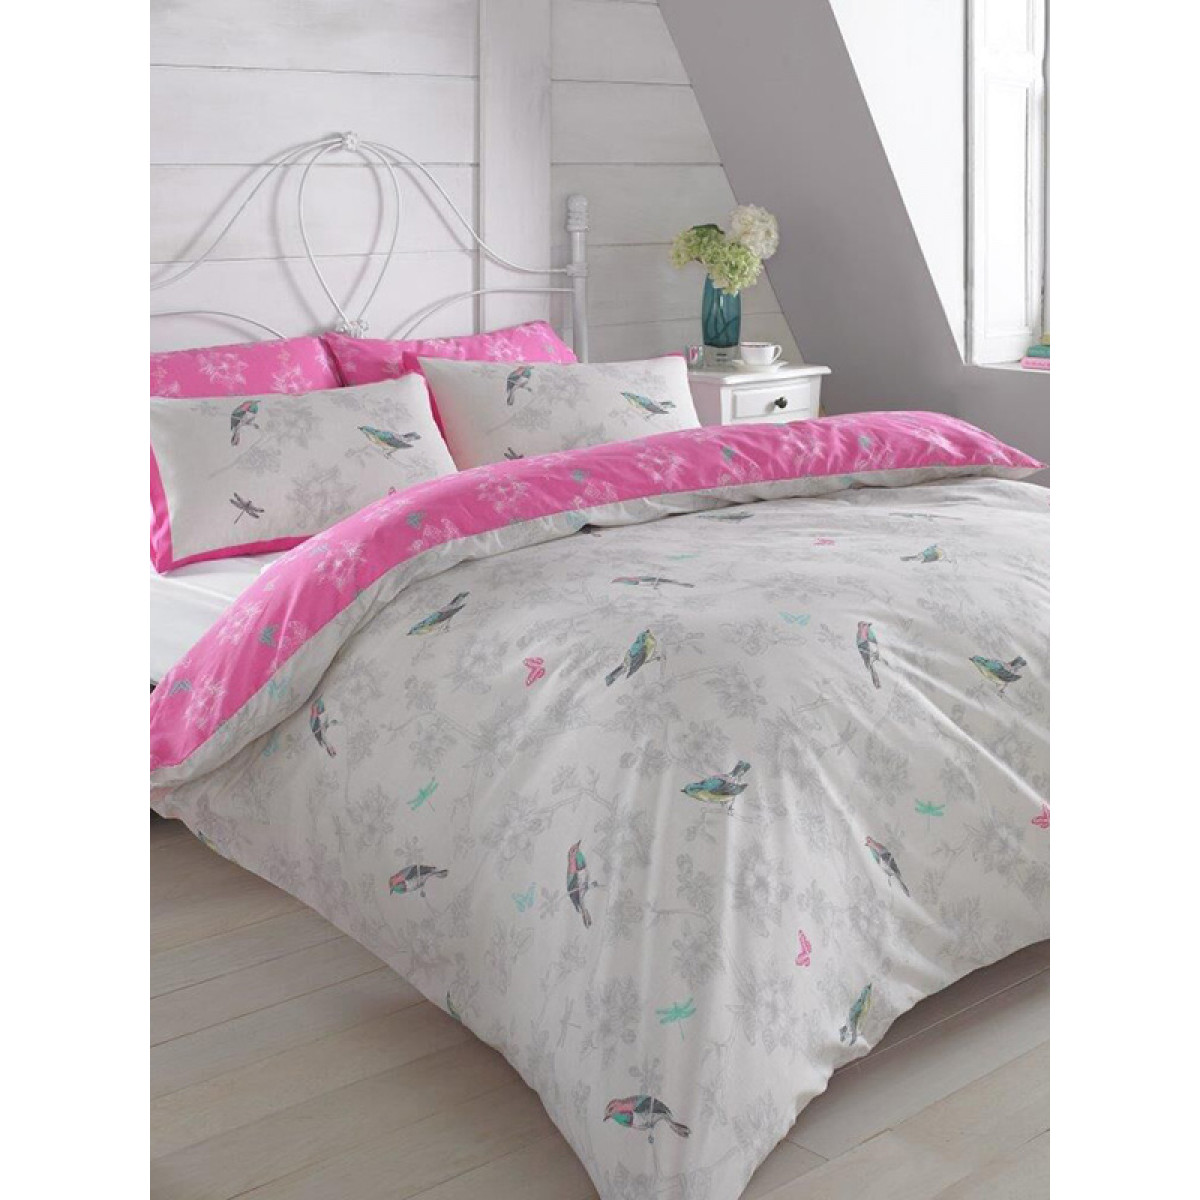 Vintage Birds Pink Single Duvet Cover And Pillowcase Set